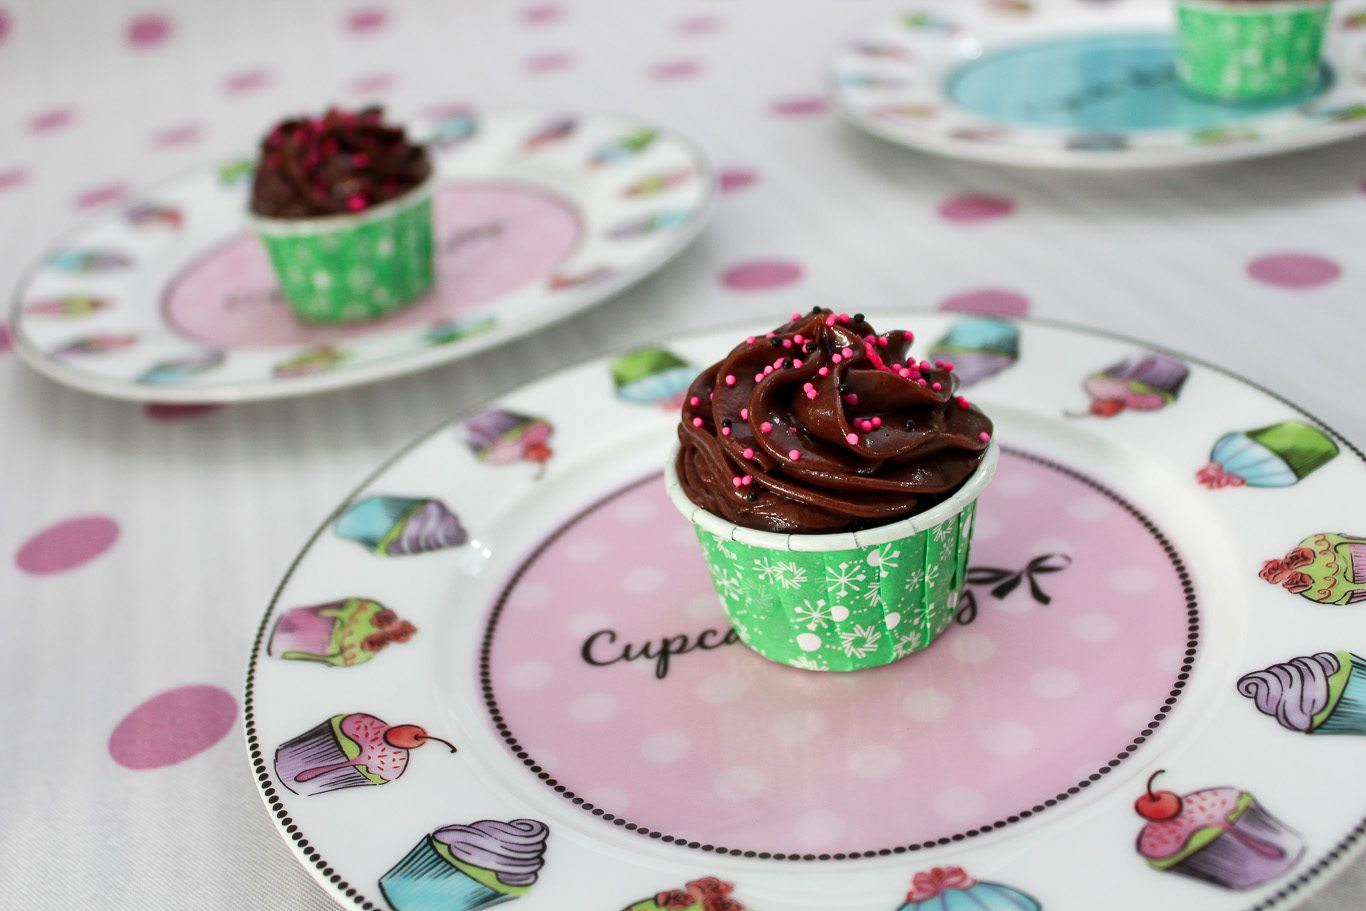 The-ultimate-chocolate-cupcake